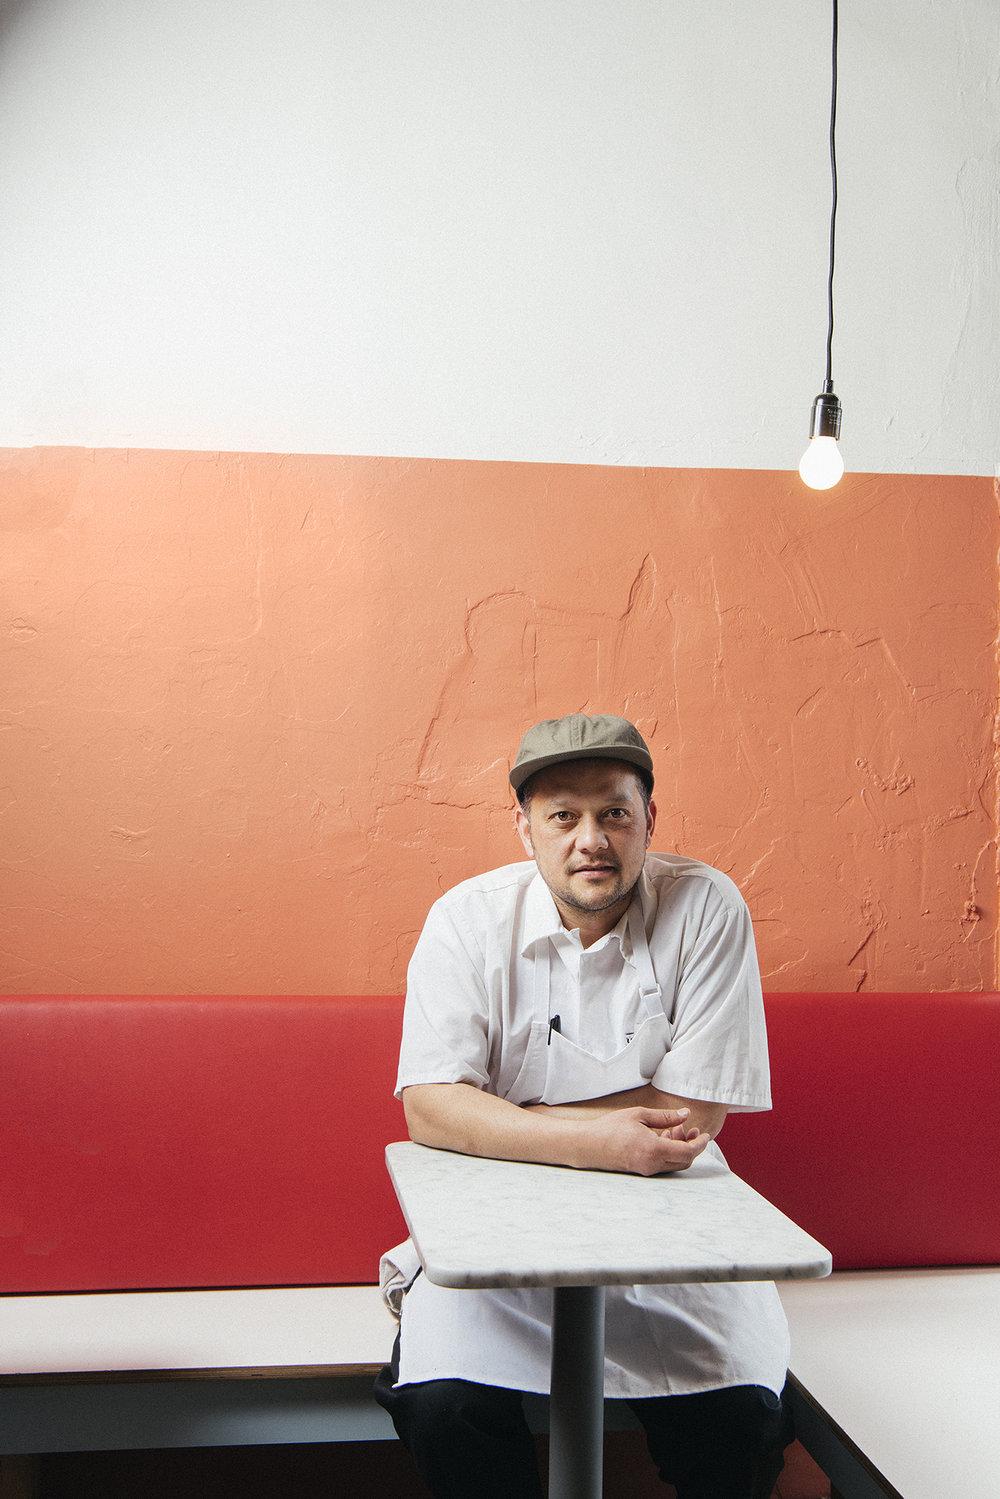 Chef, photographer, DJ, raconteur Raph Rashid